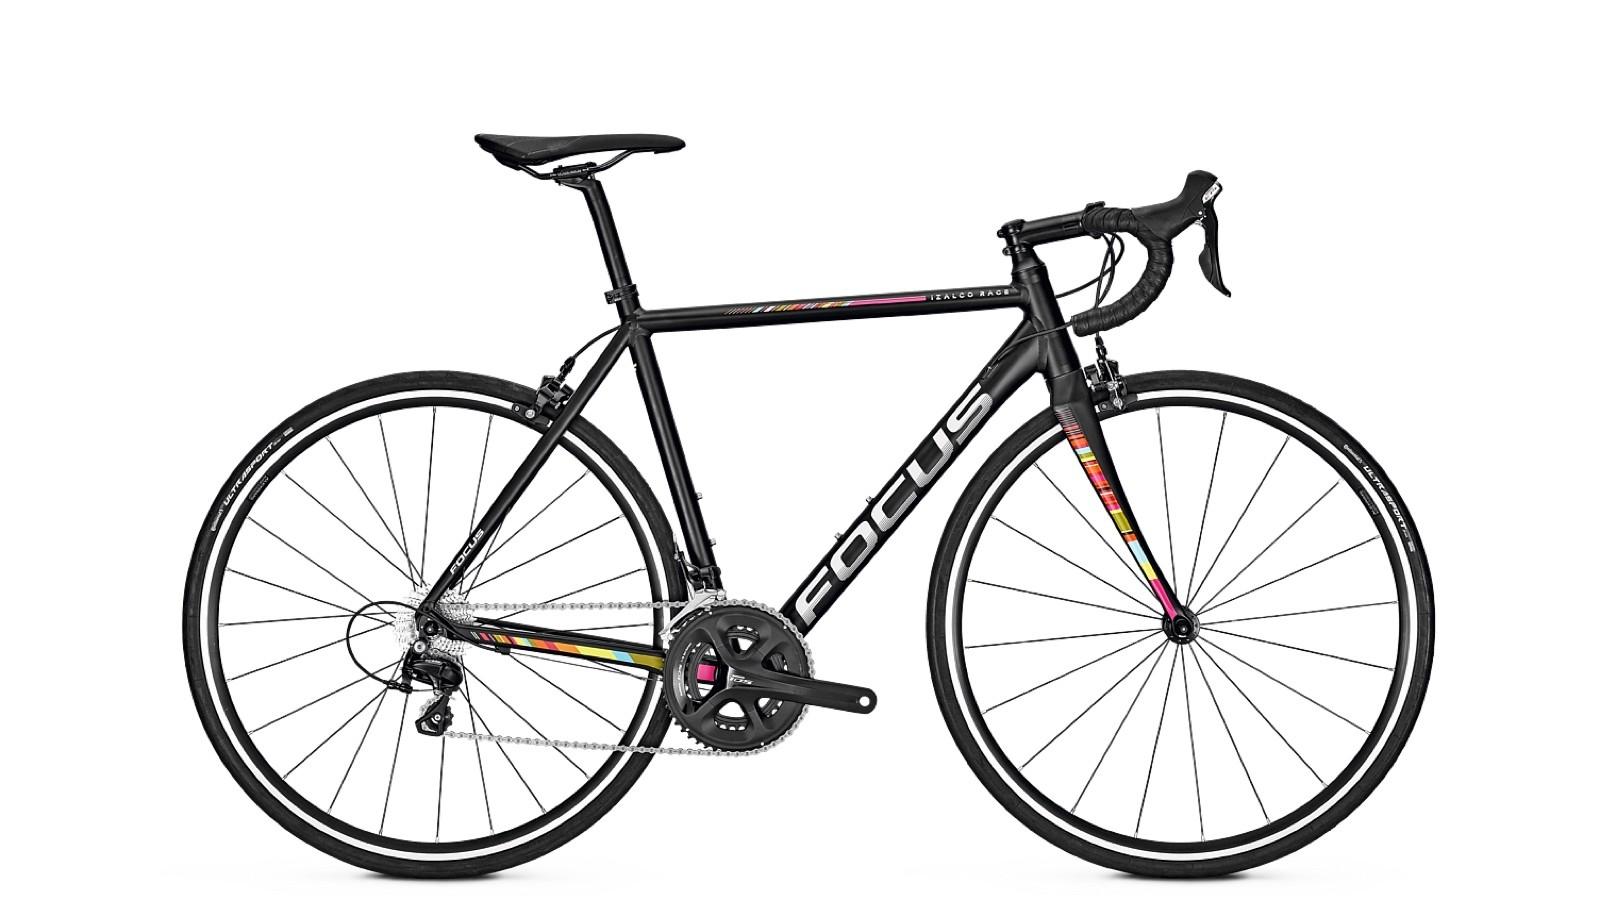 My large test bike weighs 9.24kg